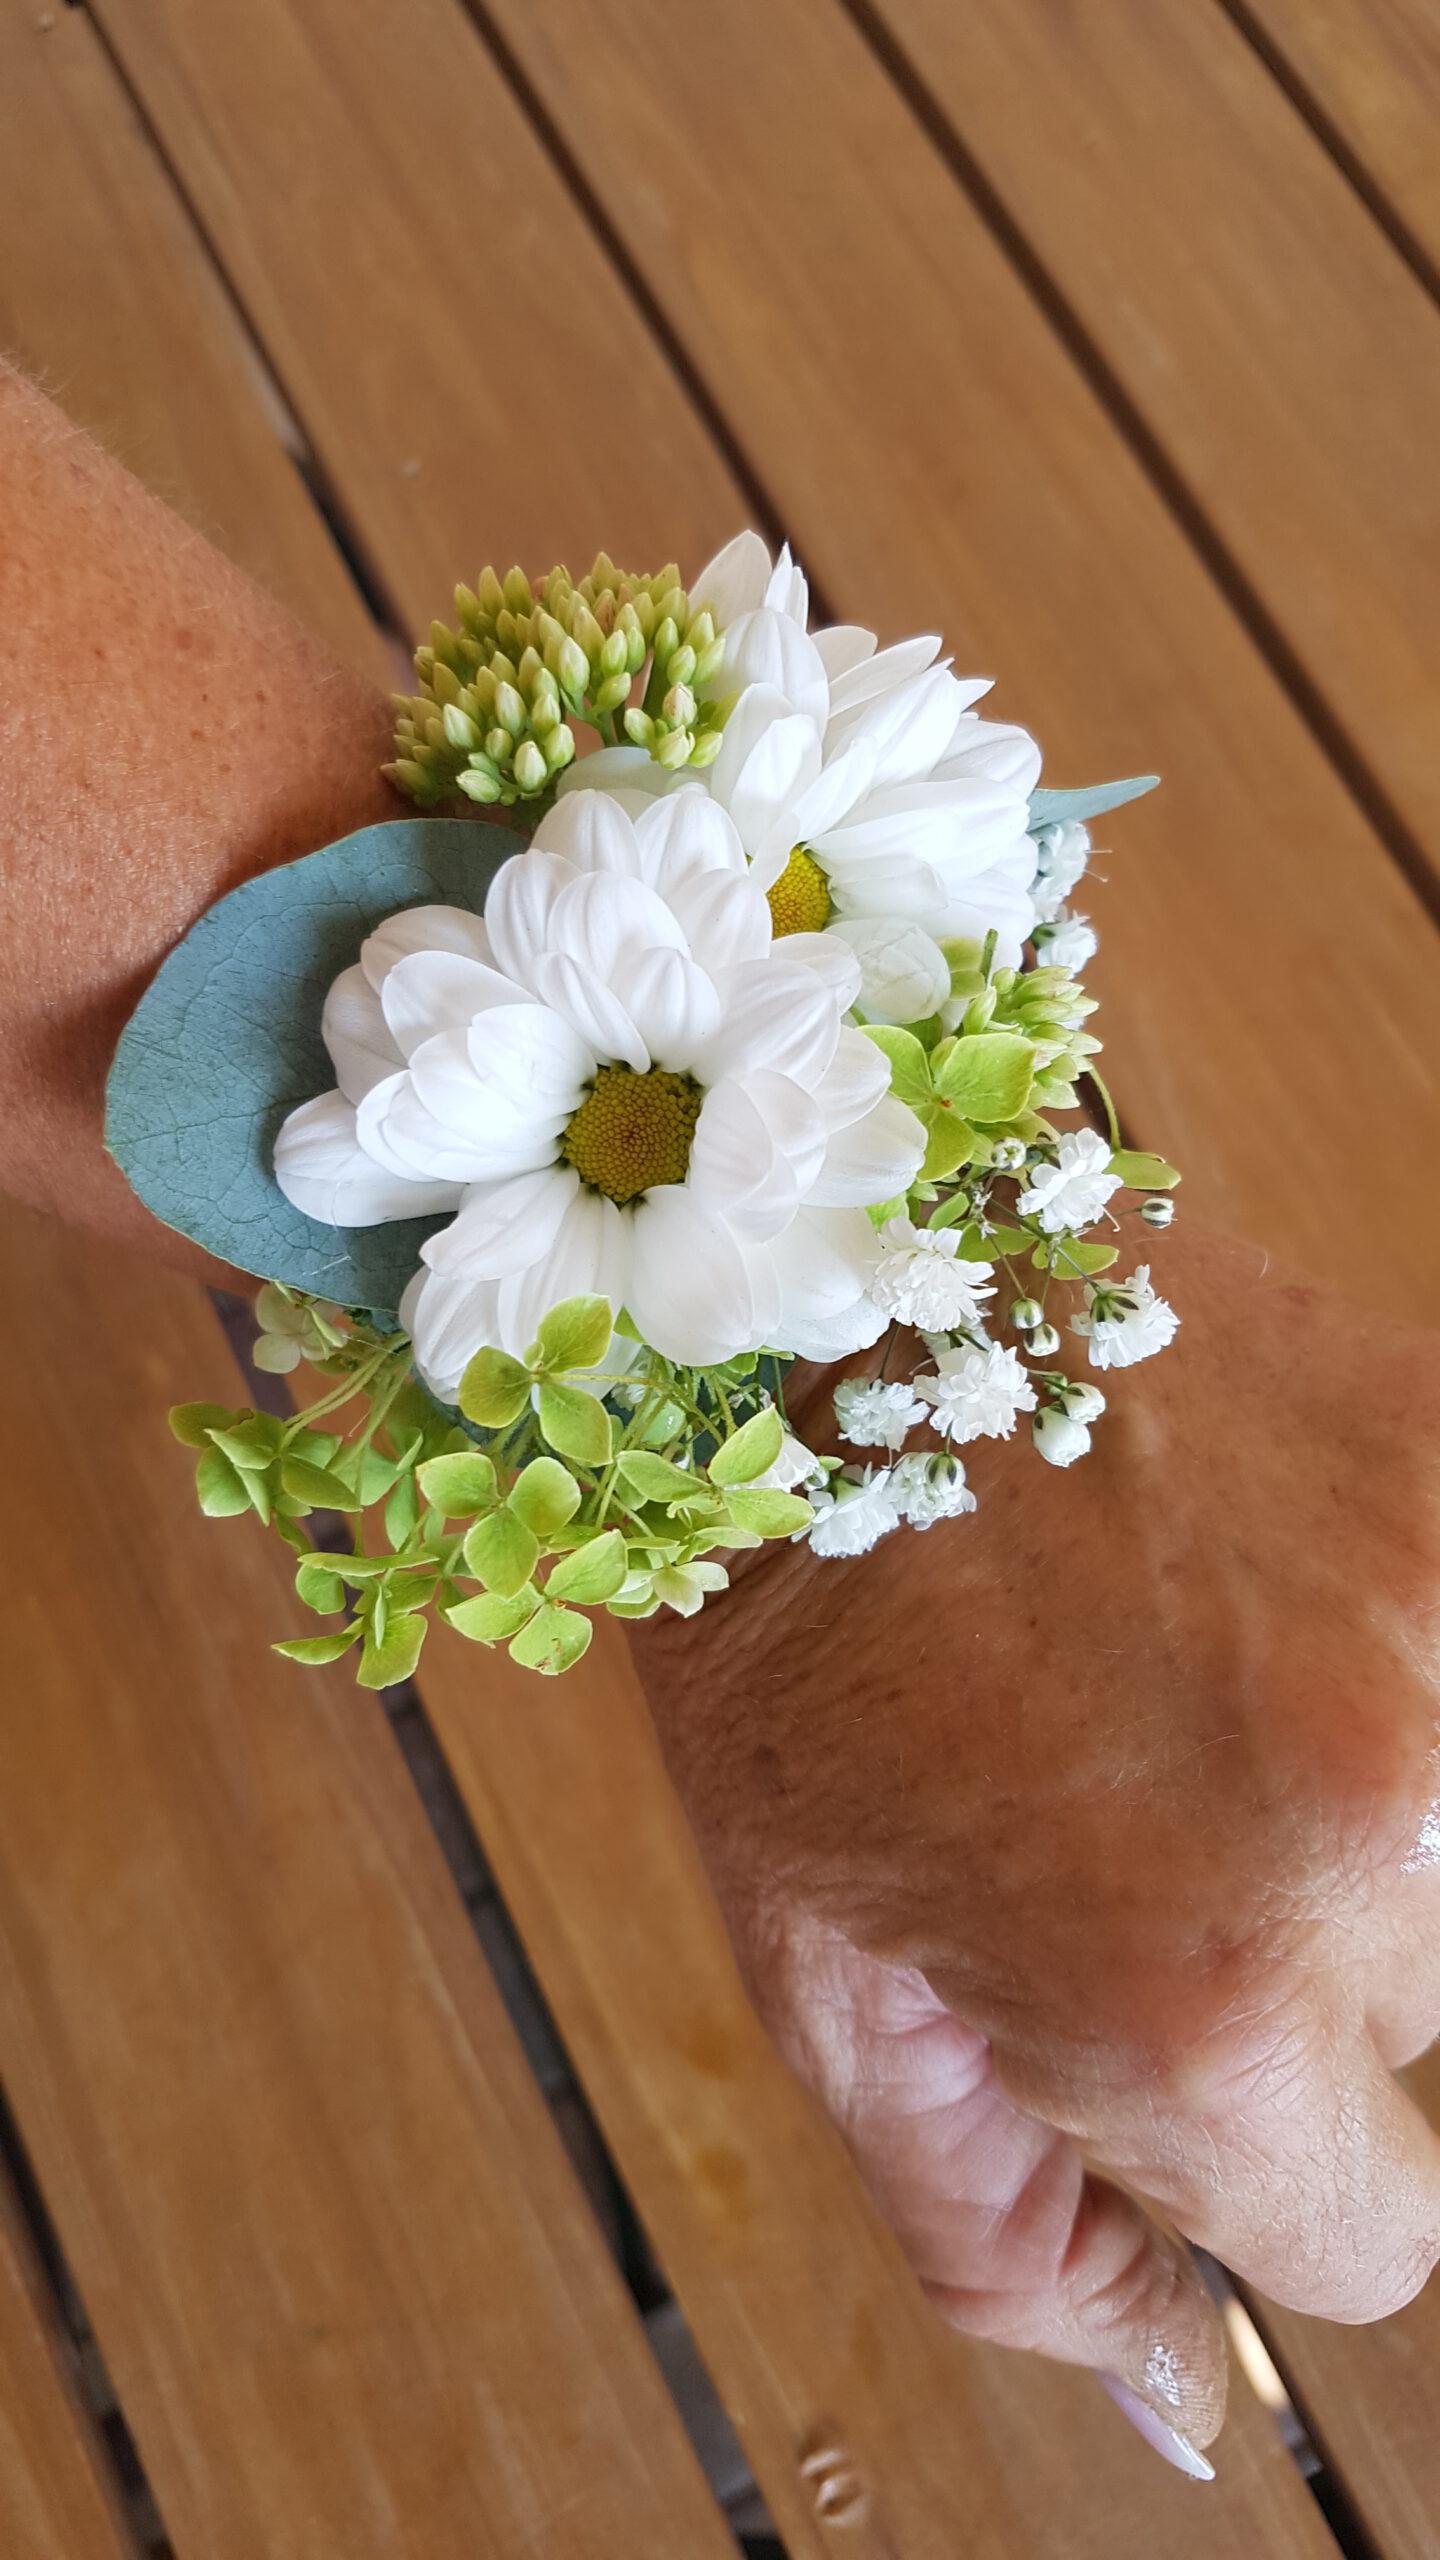 florales Armband weiße Chrysantheme